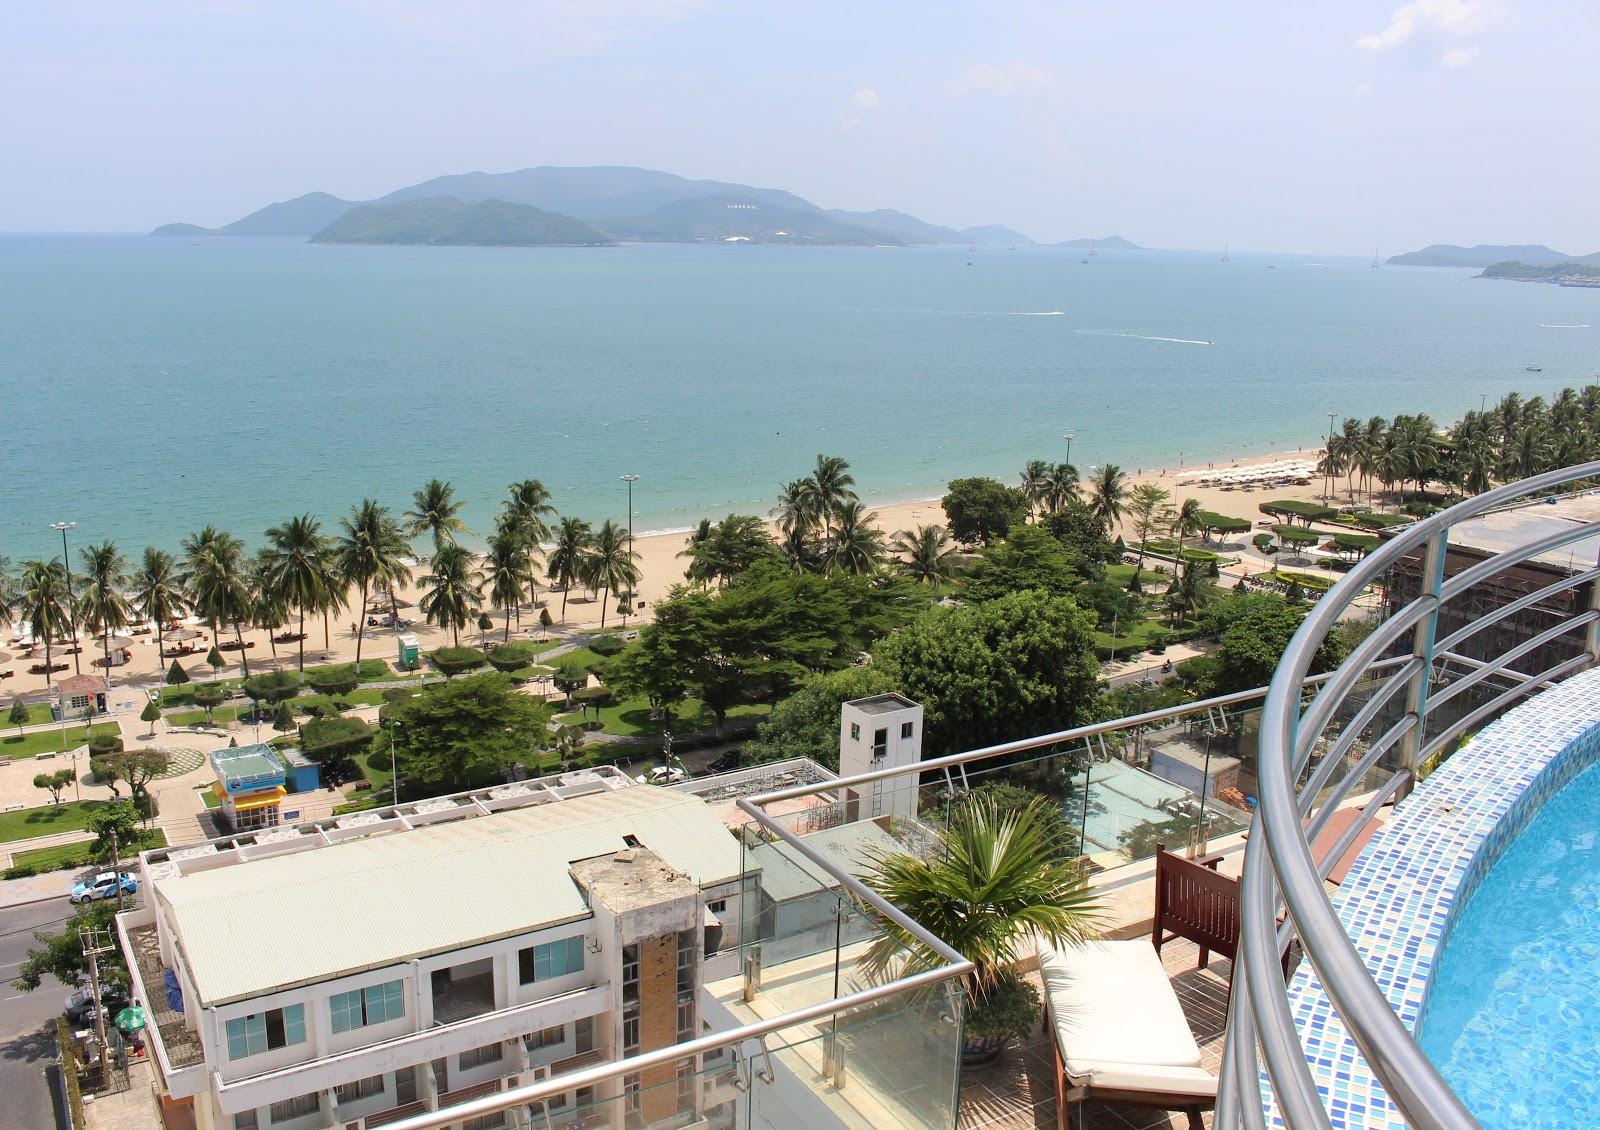 Prime Hotel Nha Trang: Where to Stay in Nha Trang, Vietnam